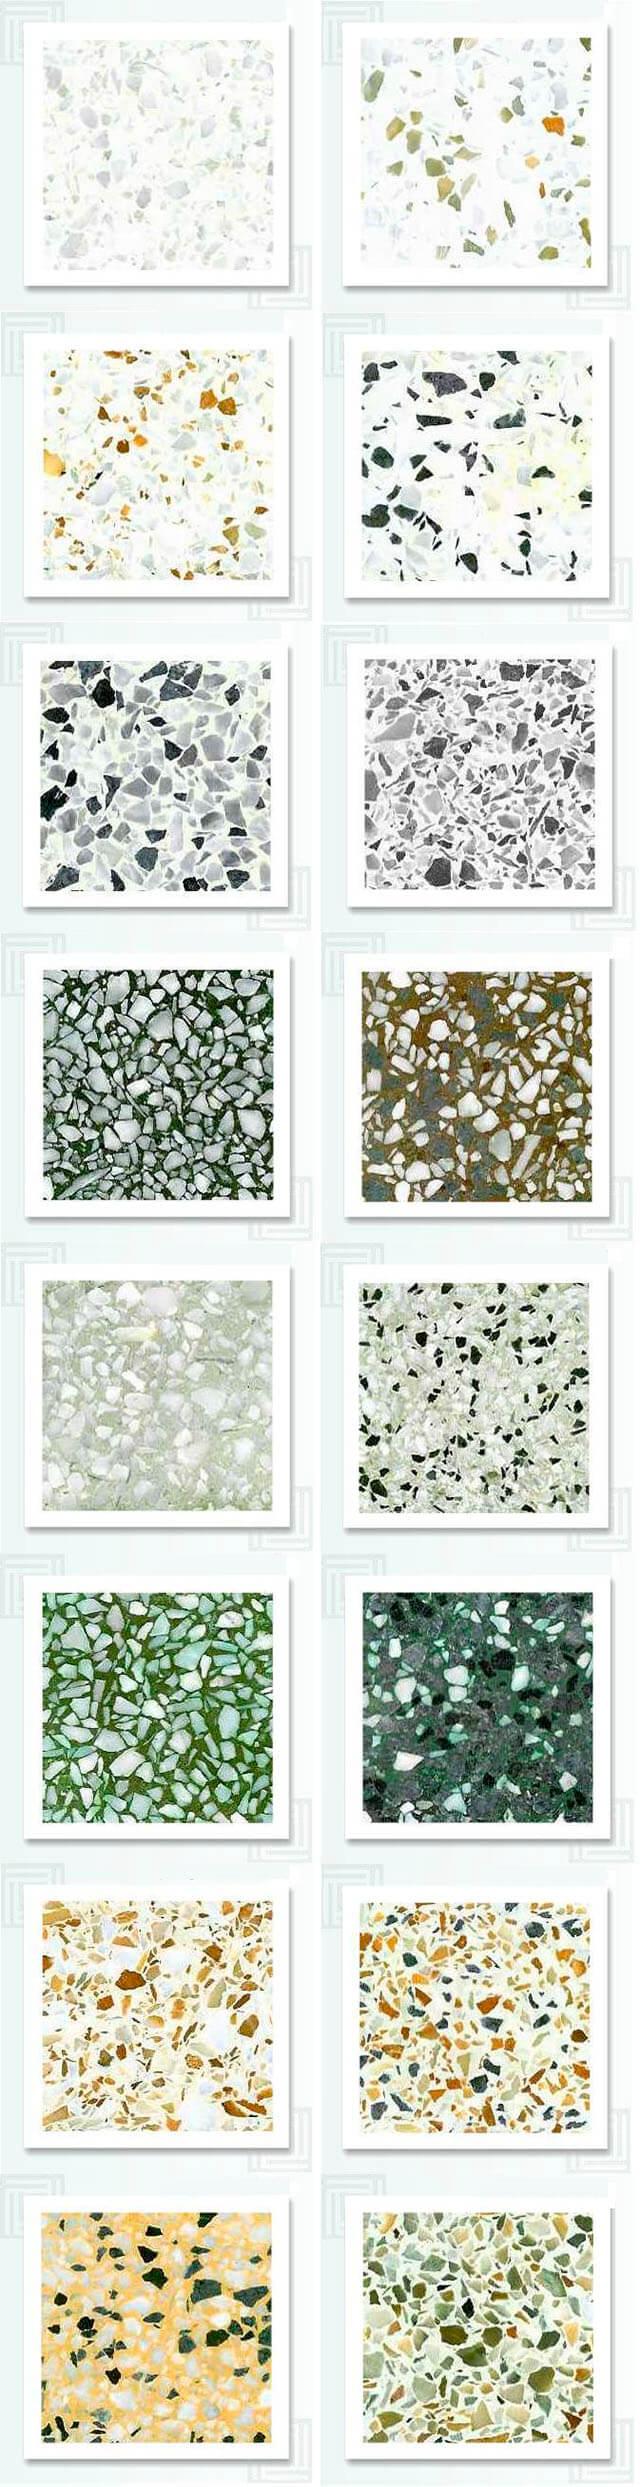 granilite texturas